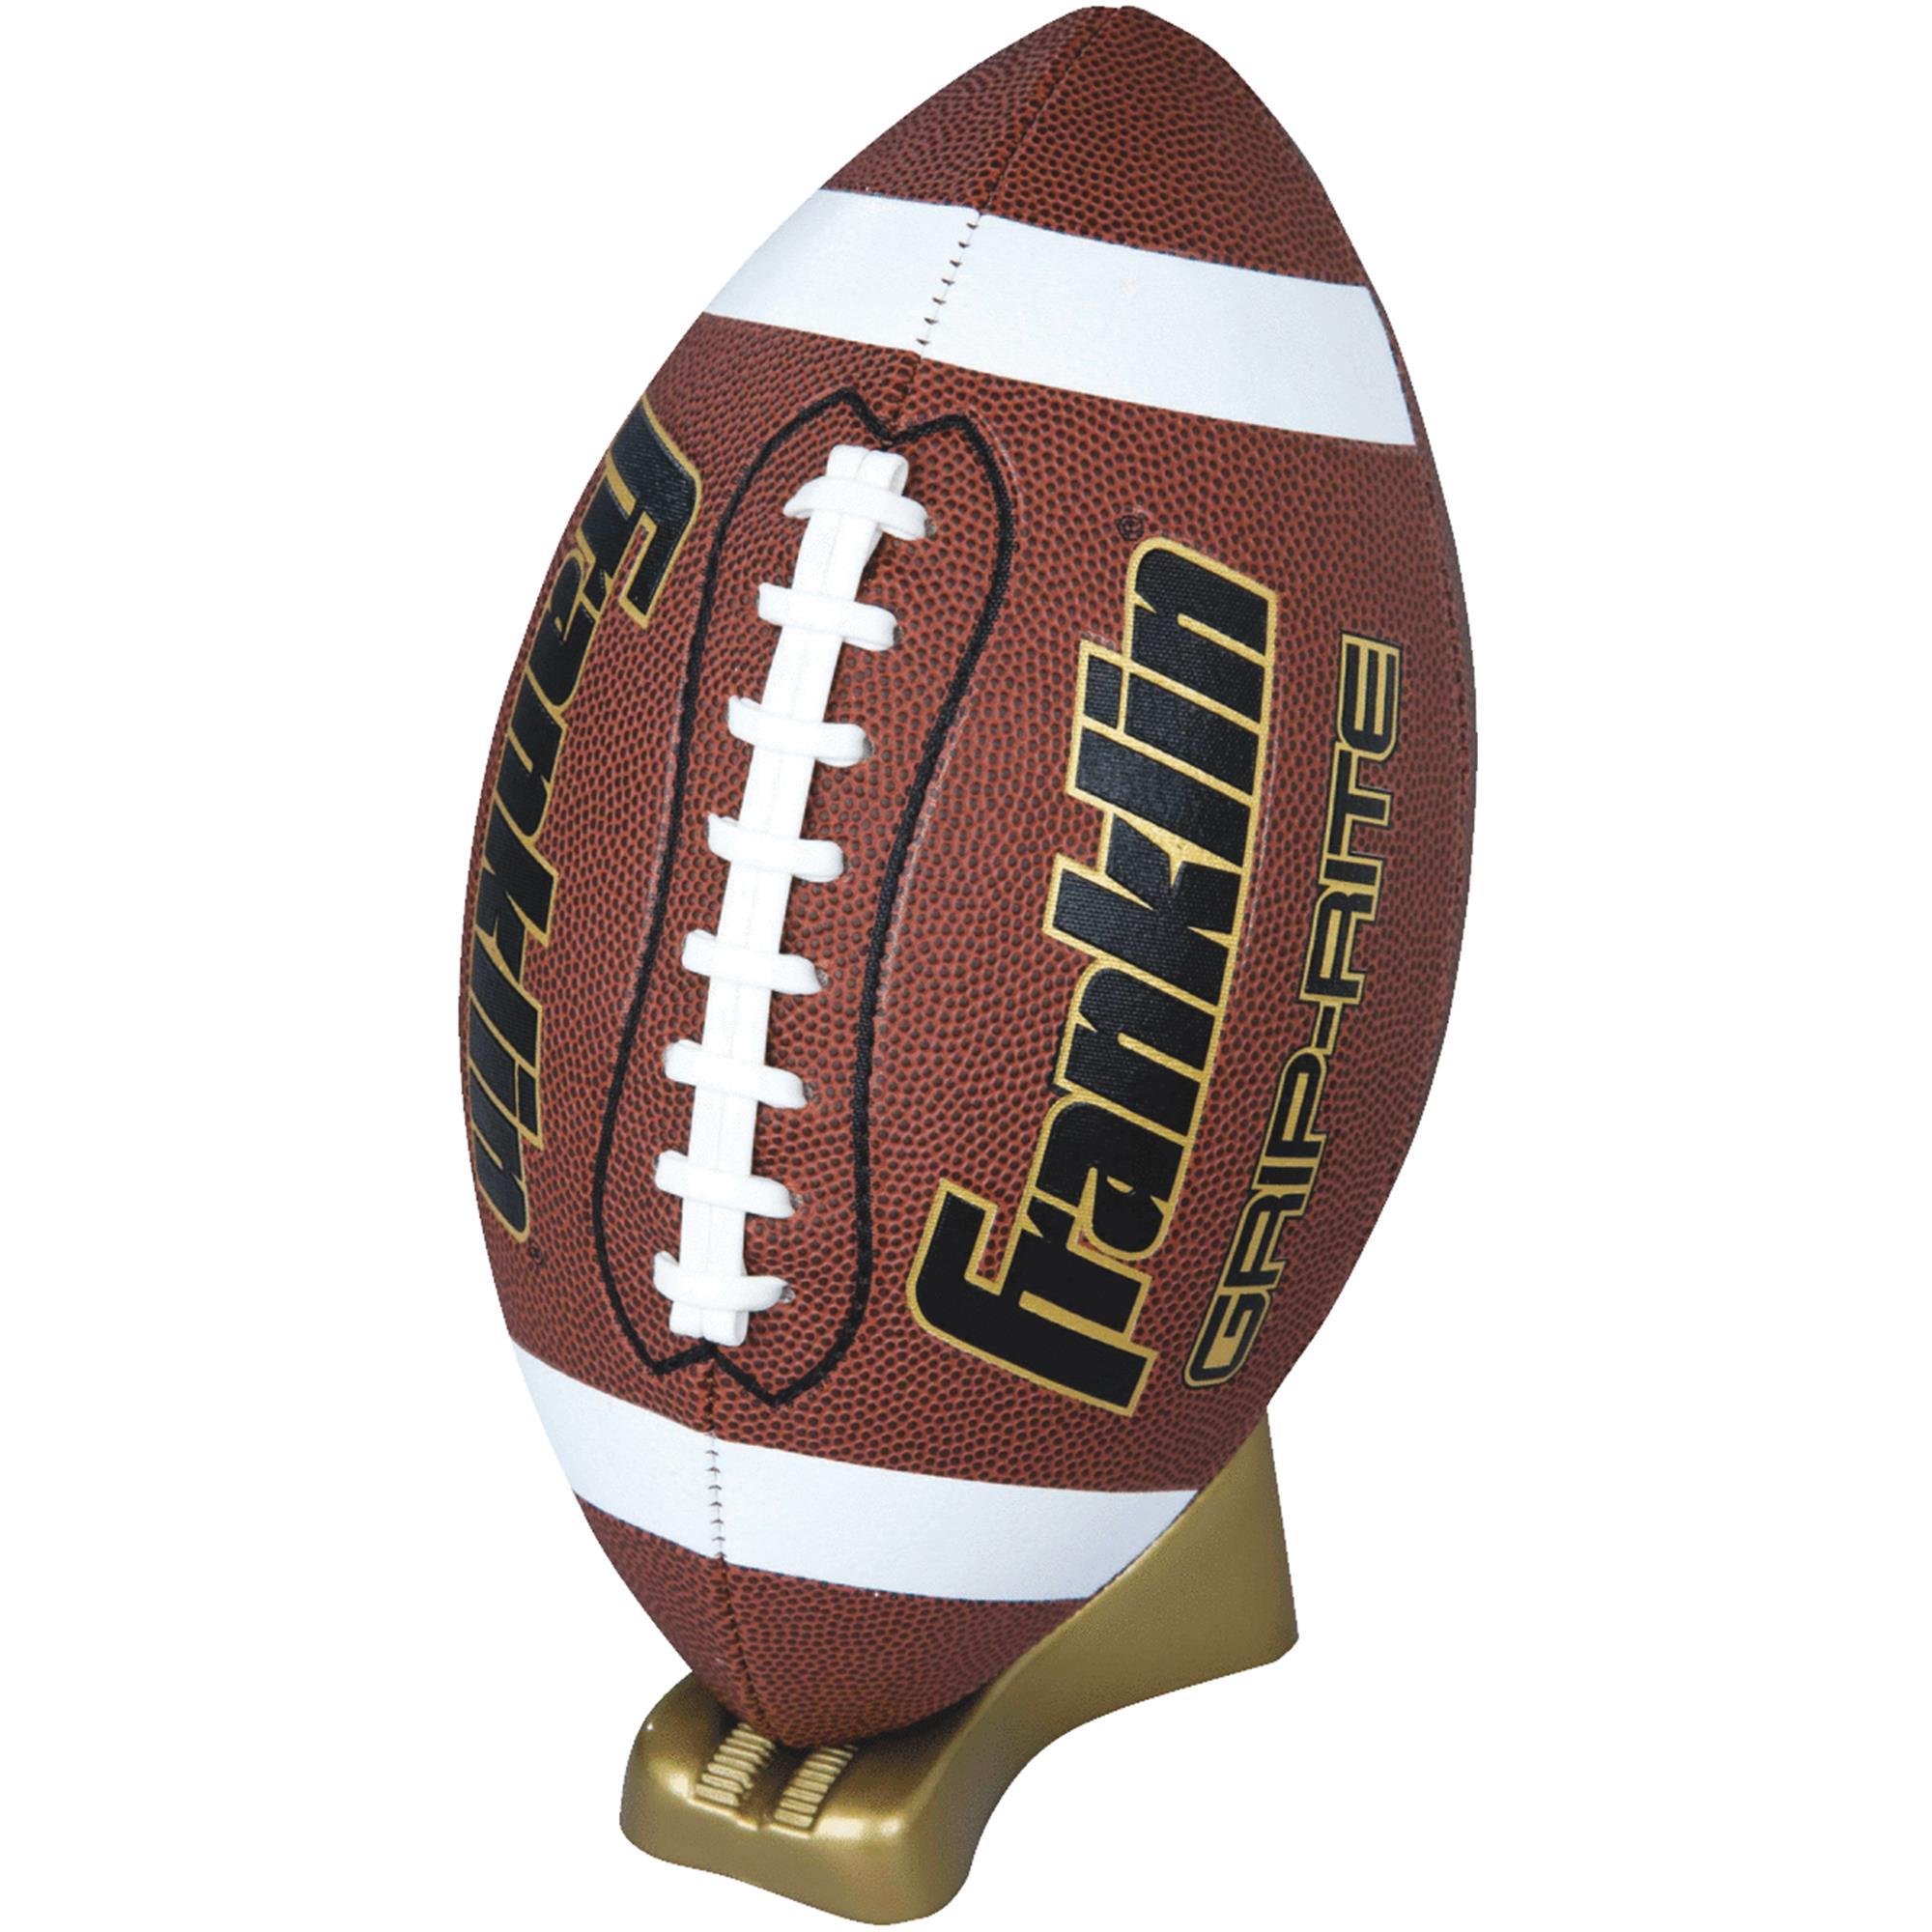 Franklin Football Kit